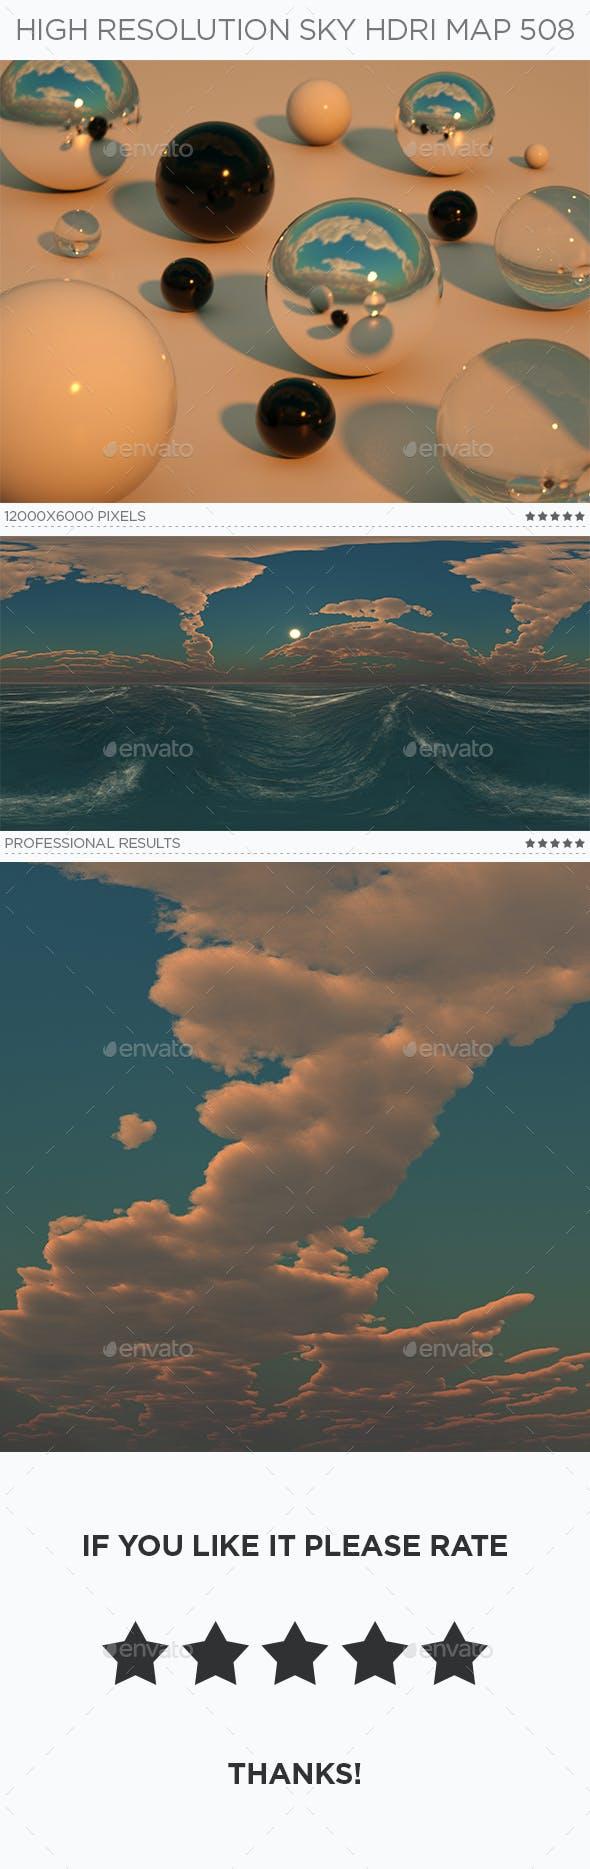 High Resolution Sky HDRi Map 508 - 3DOcean Item for Sale